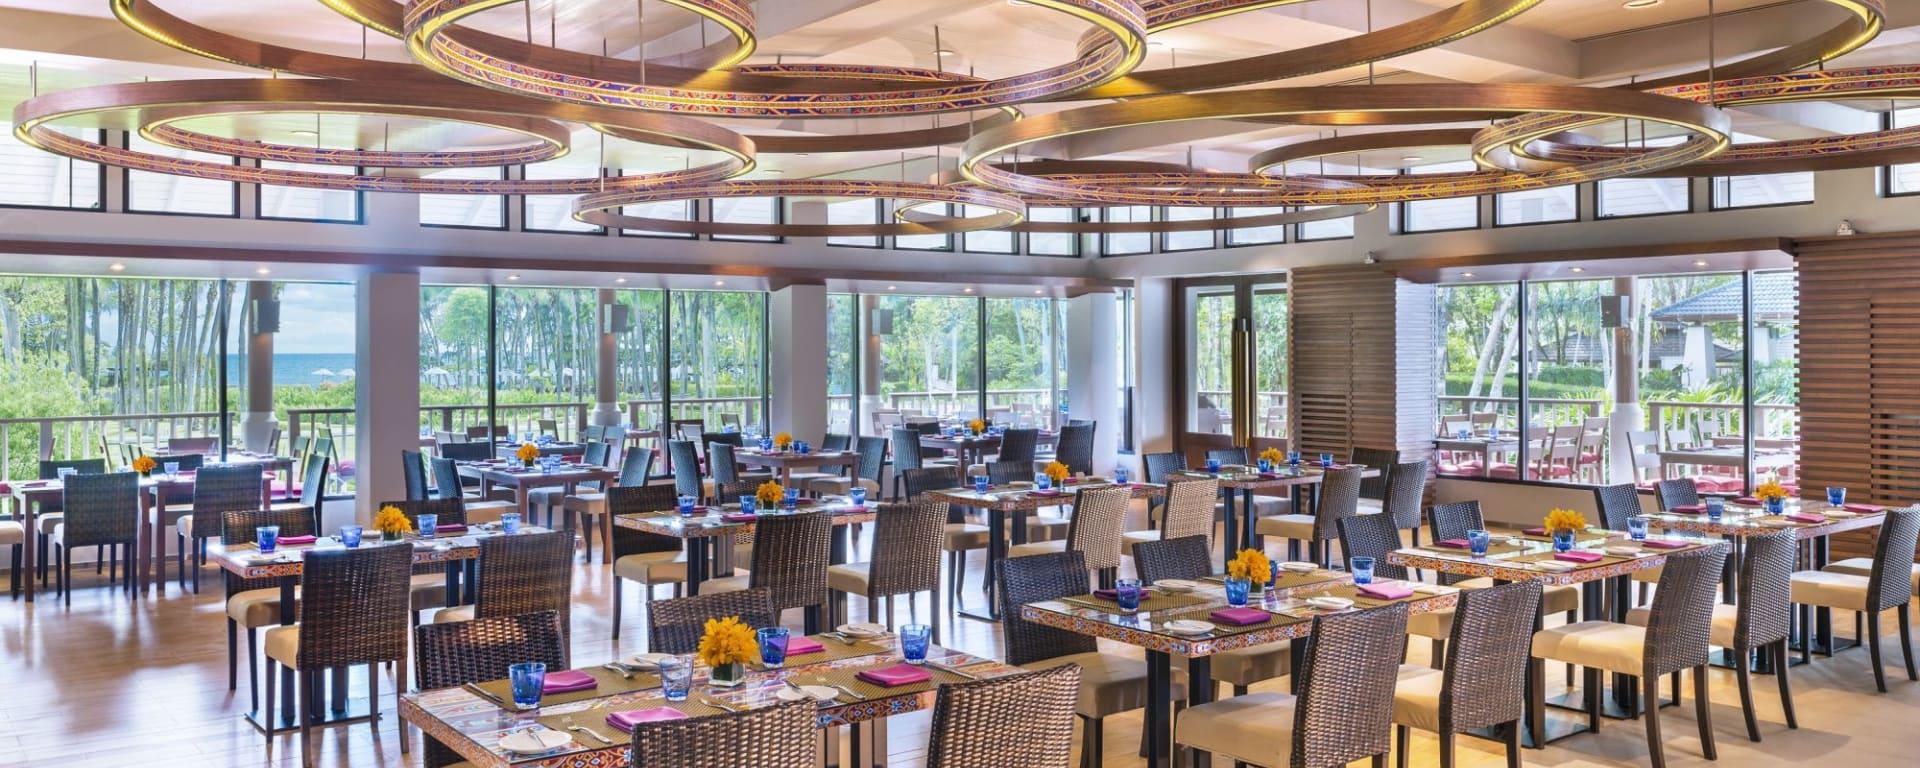 Dusit Thani Krabi Beach Resort: Mangosteens Restaurant